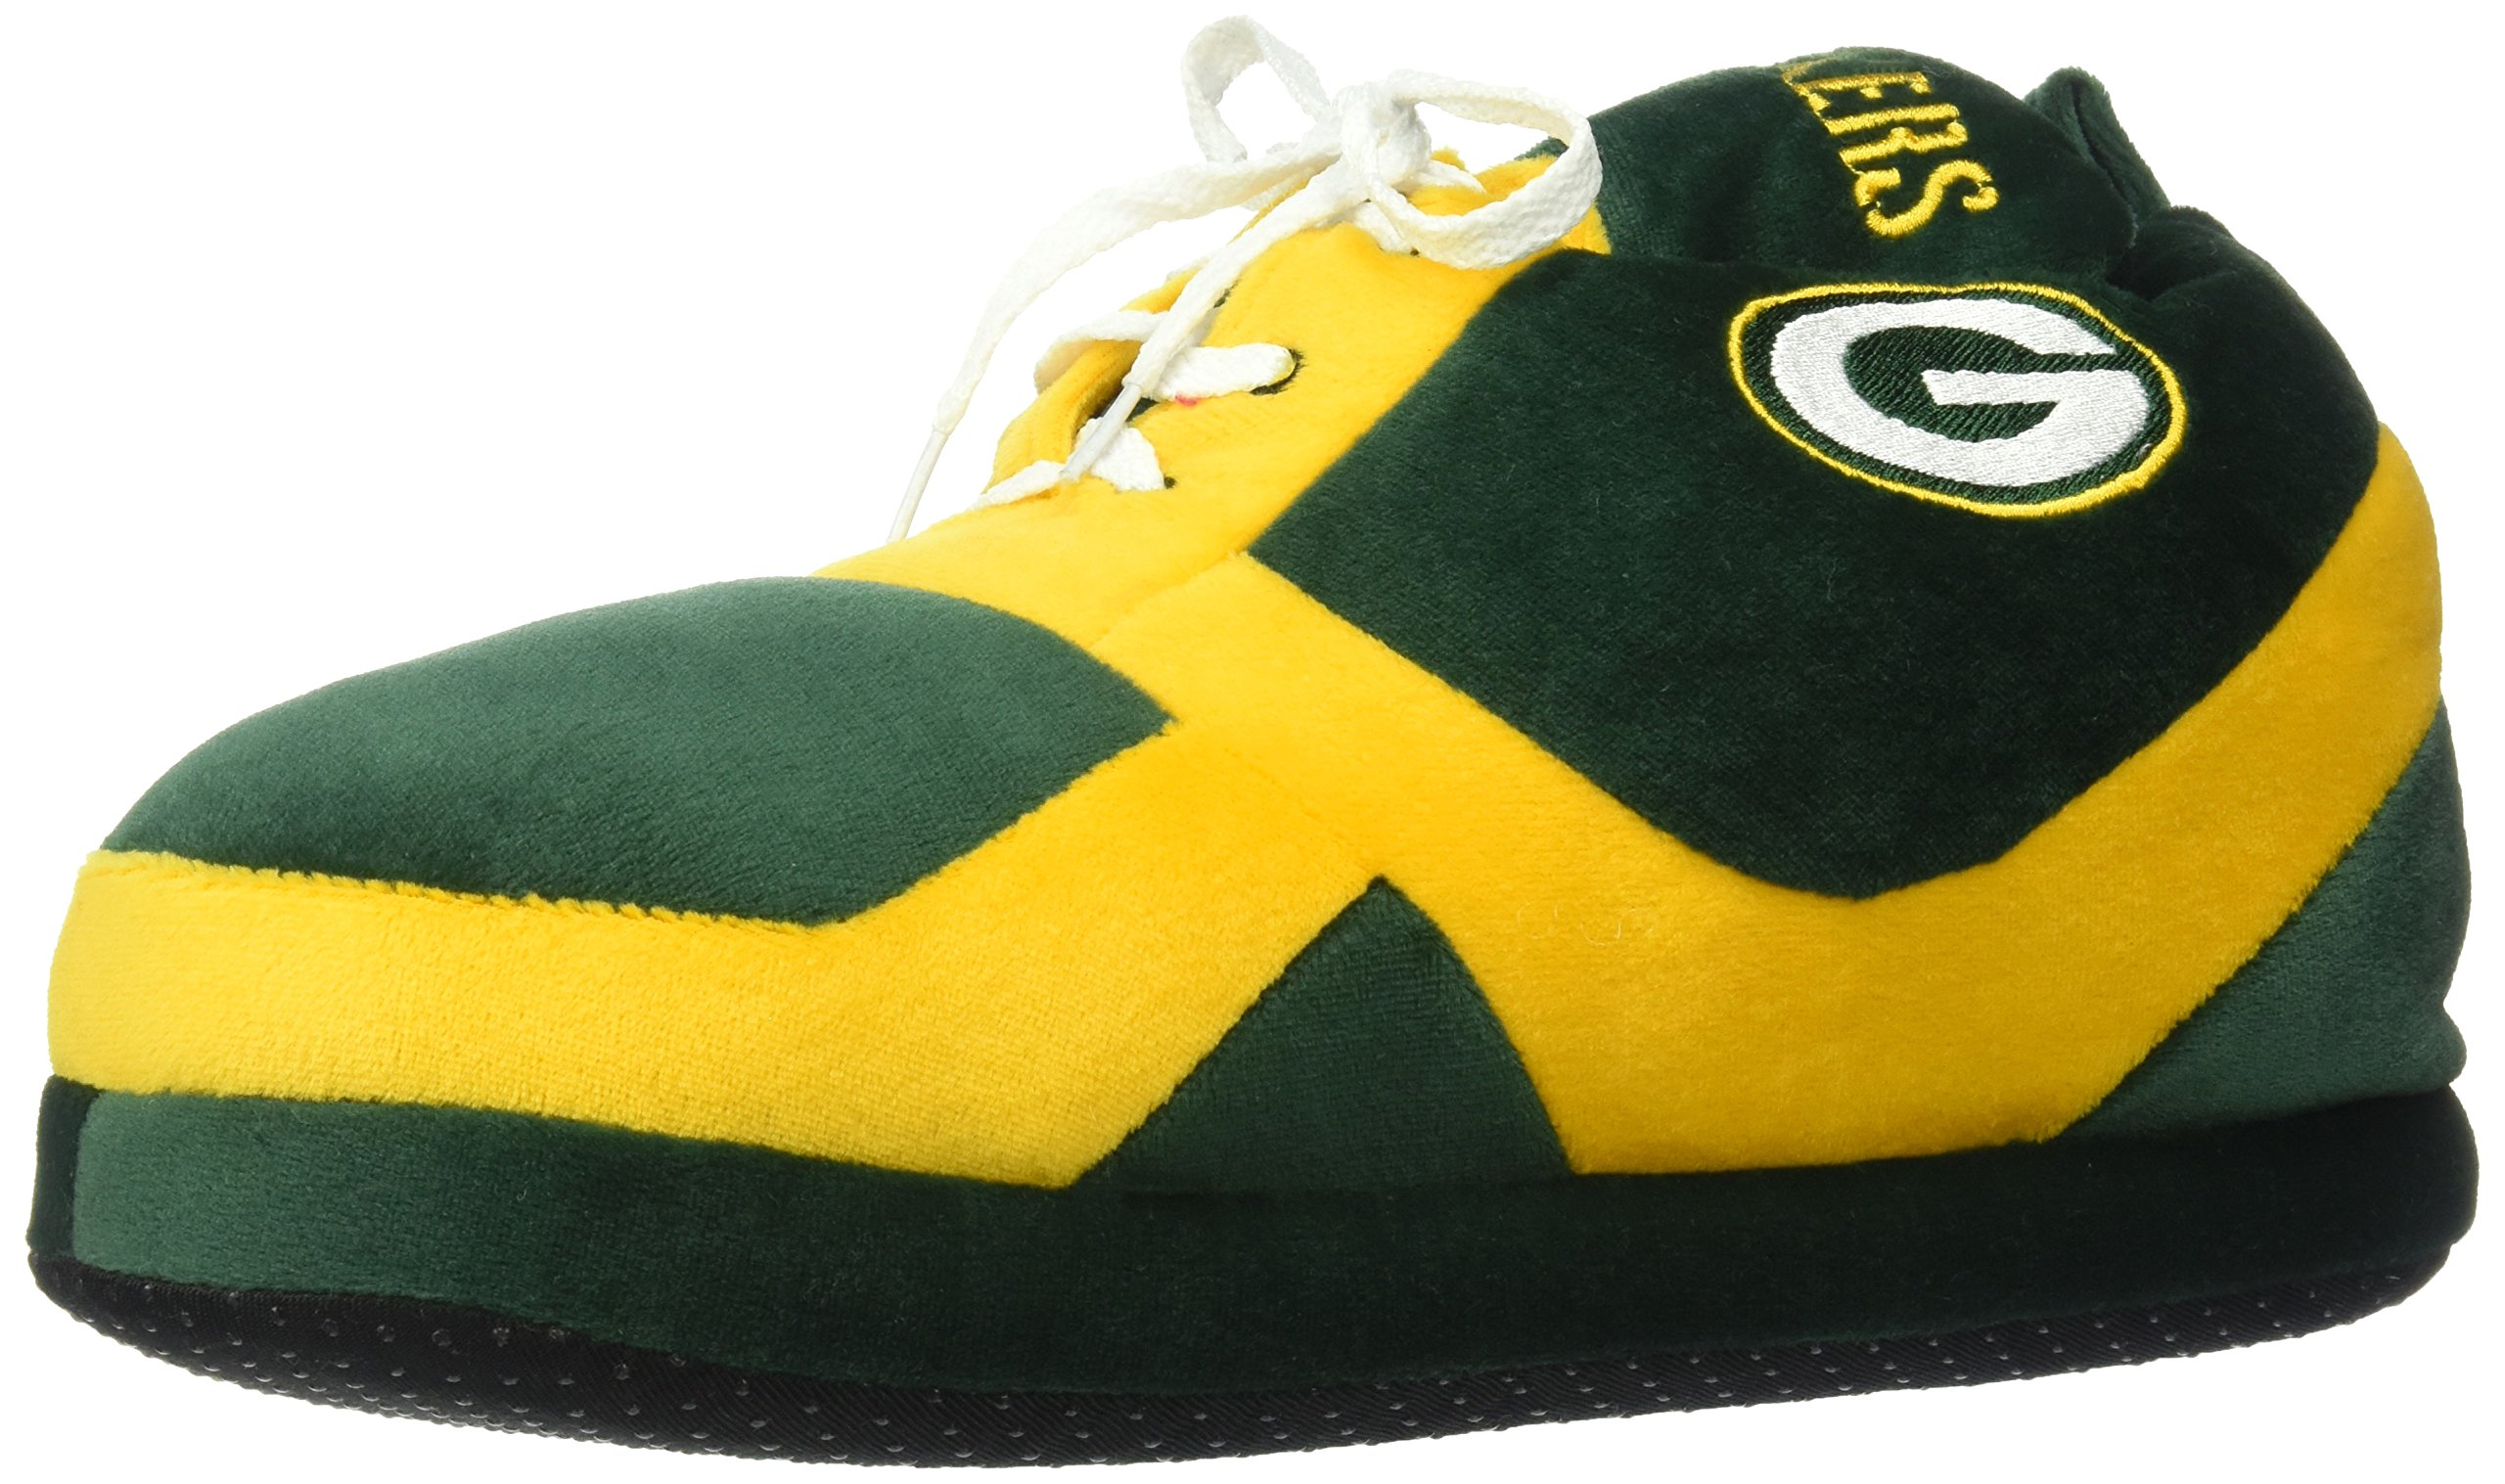 FOCO Green Bay Packers 2015 Sneaker Slipper Large